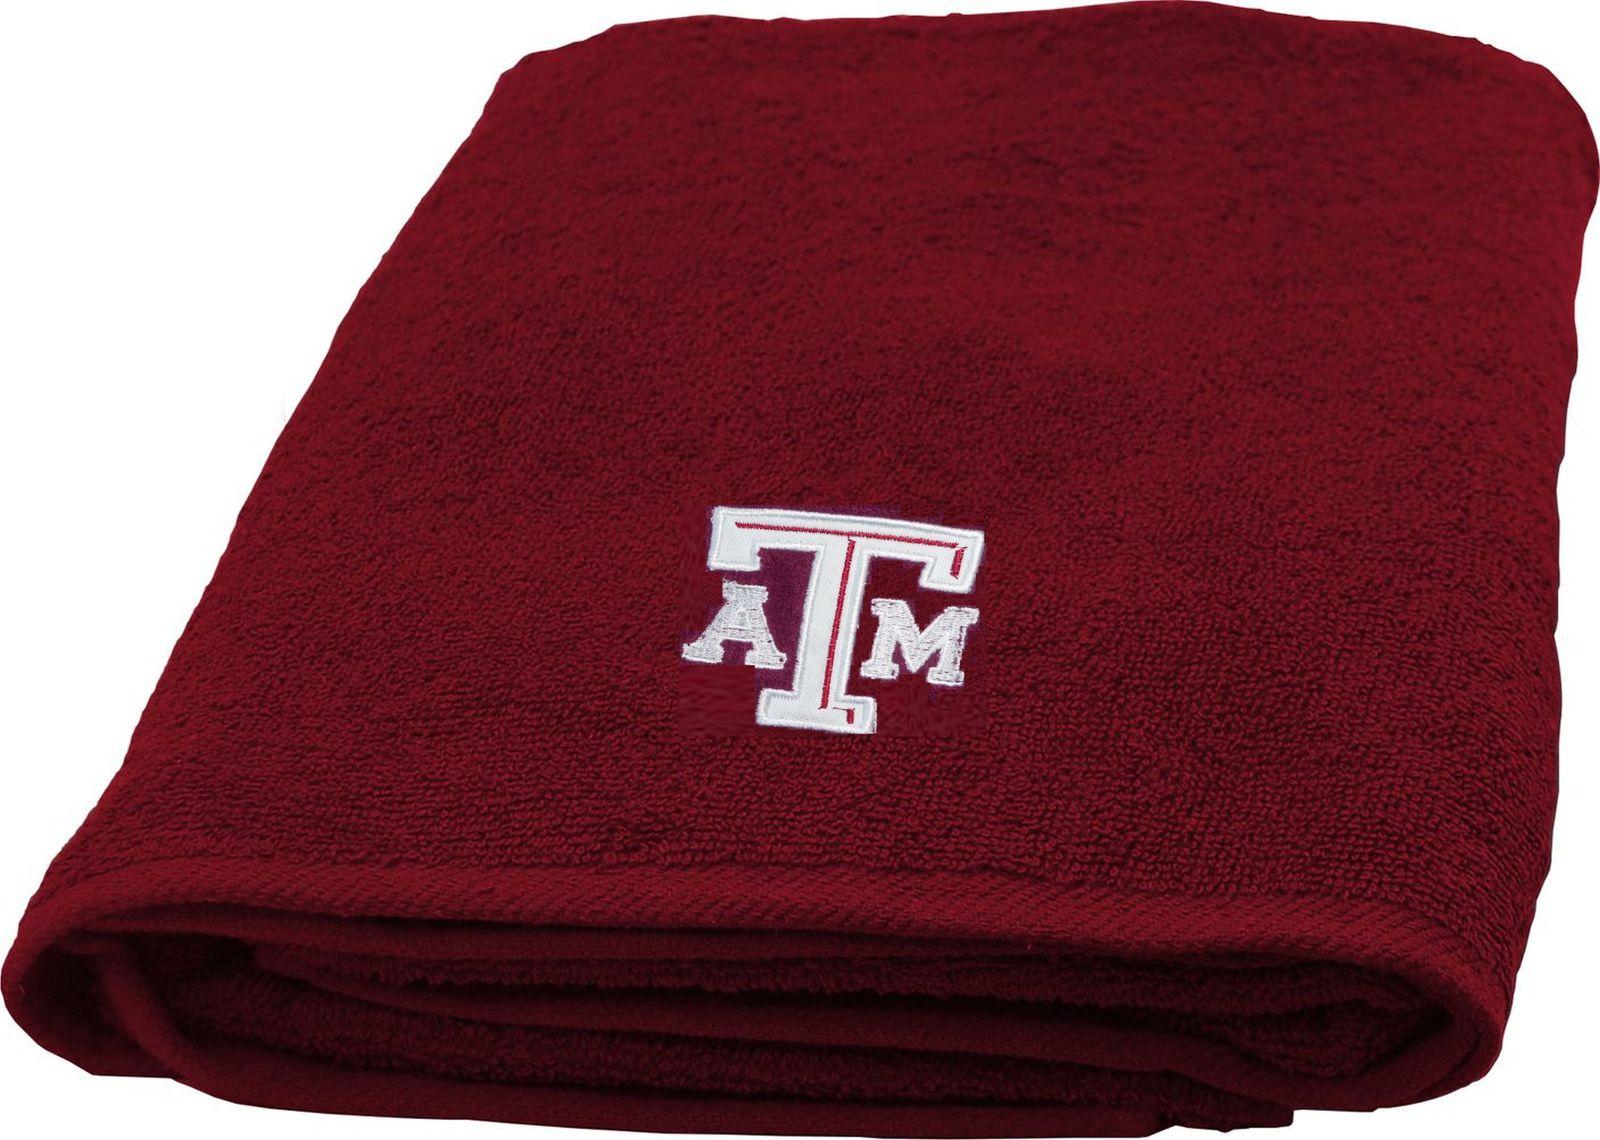 282a2d21 The Game Beach Towel: 0 listings